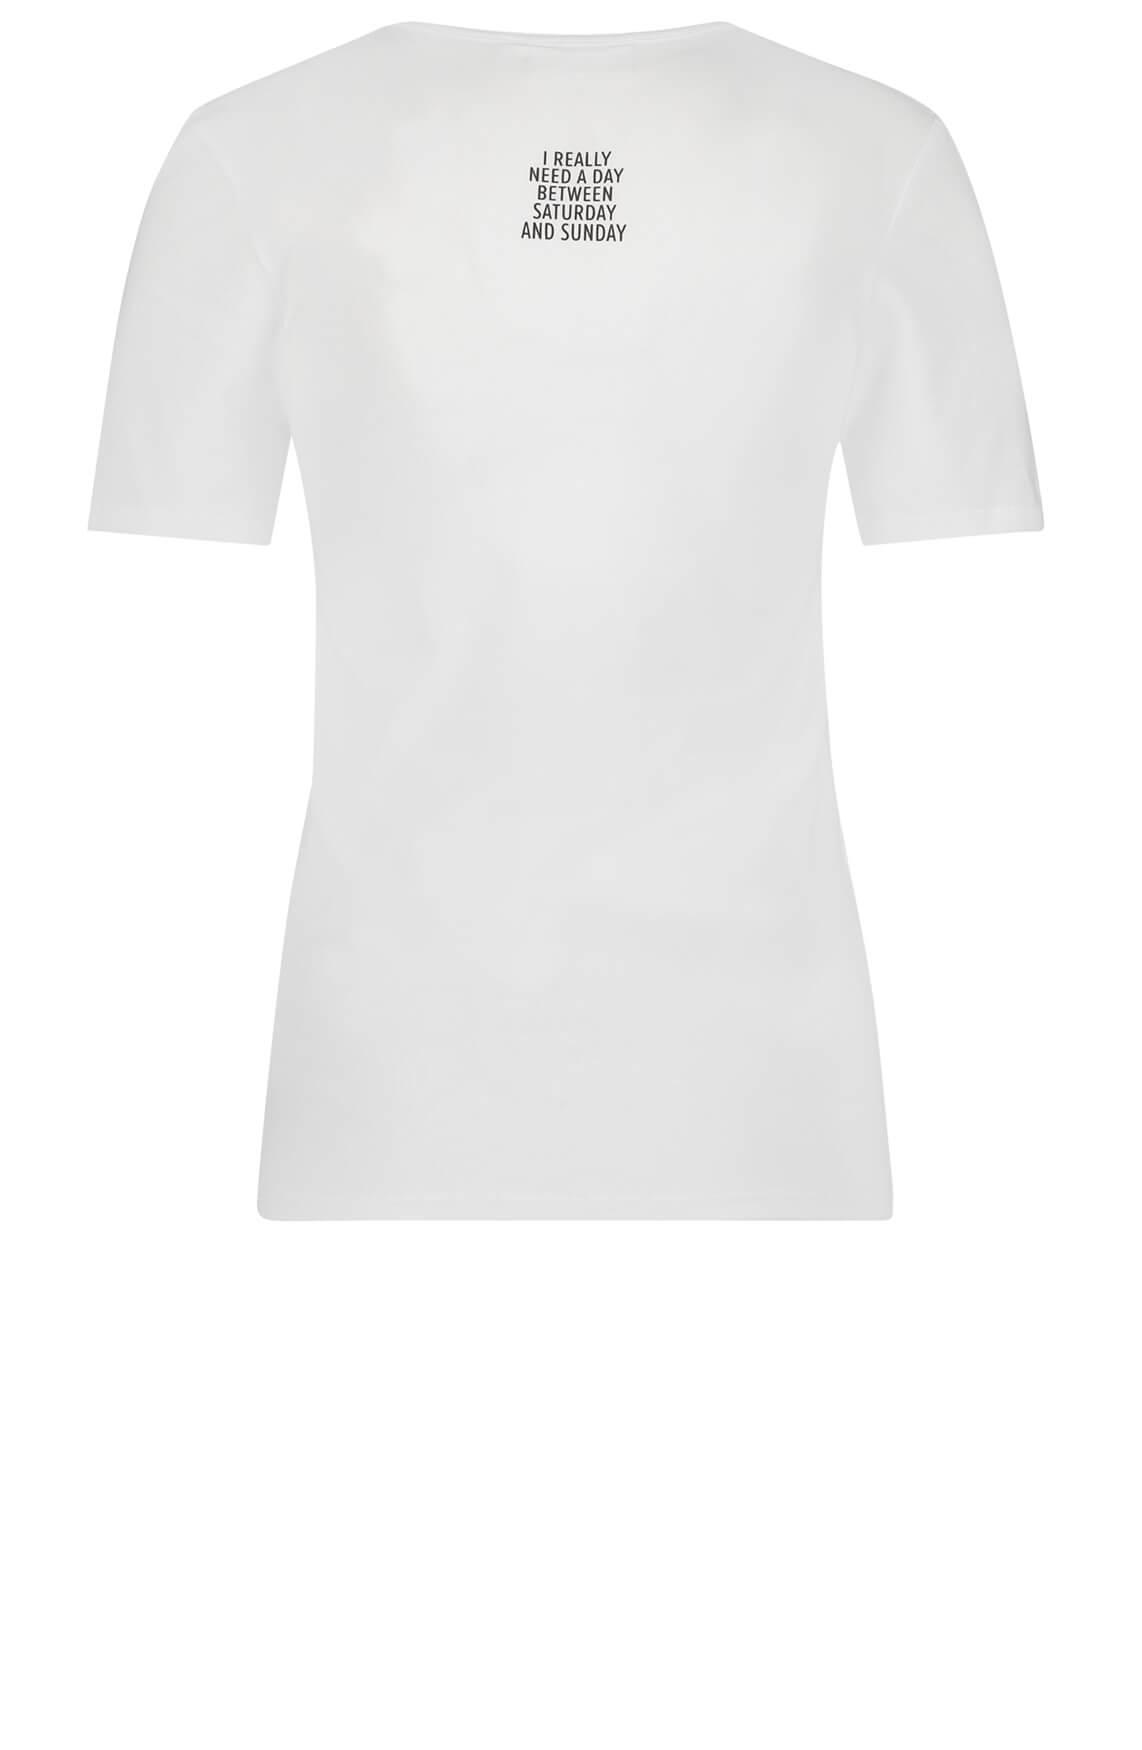 Penn & Ink Dames Shirt WKND wit